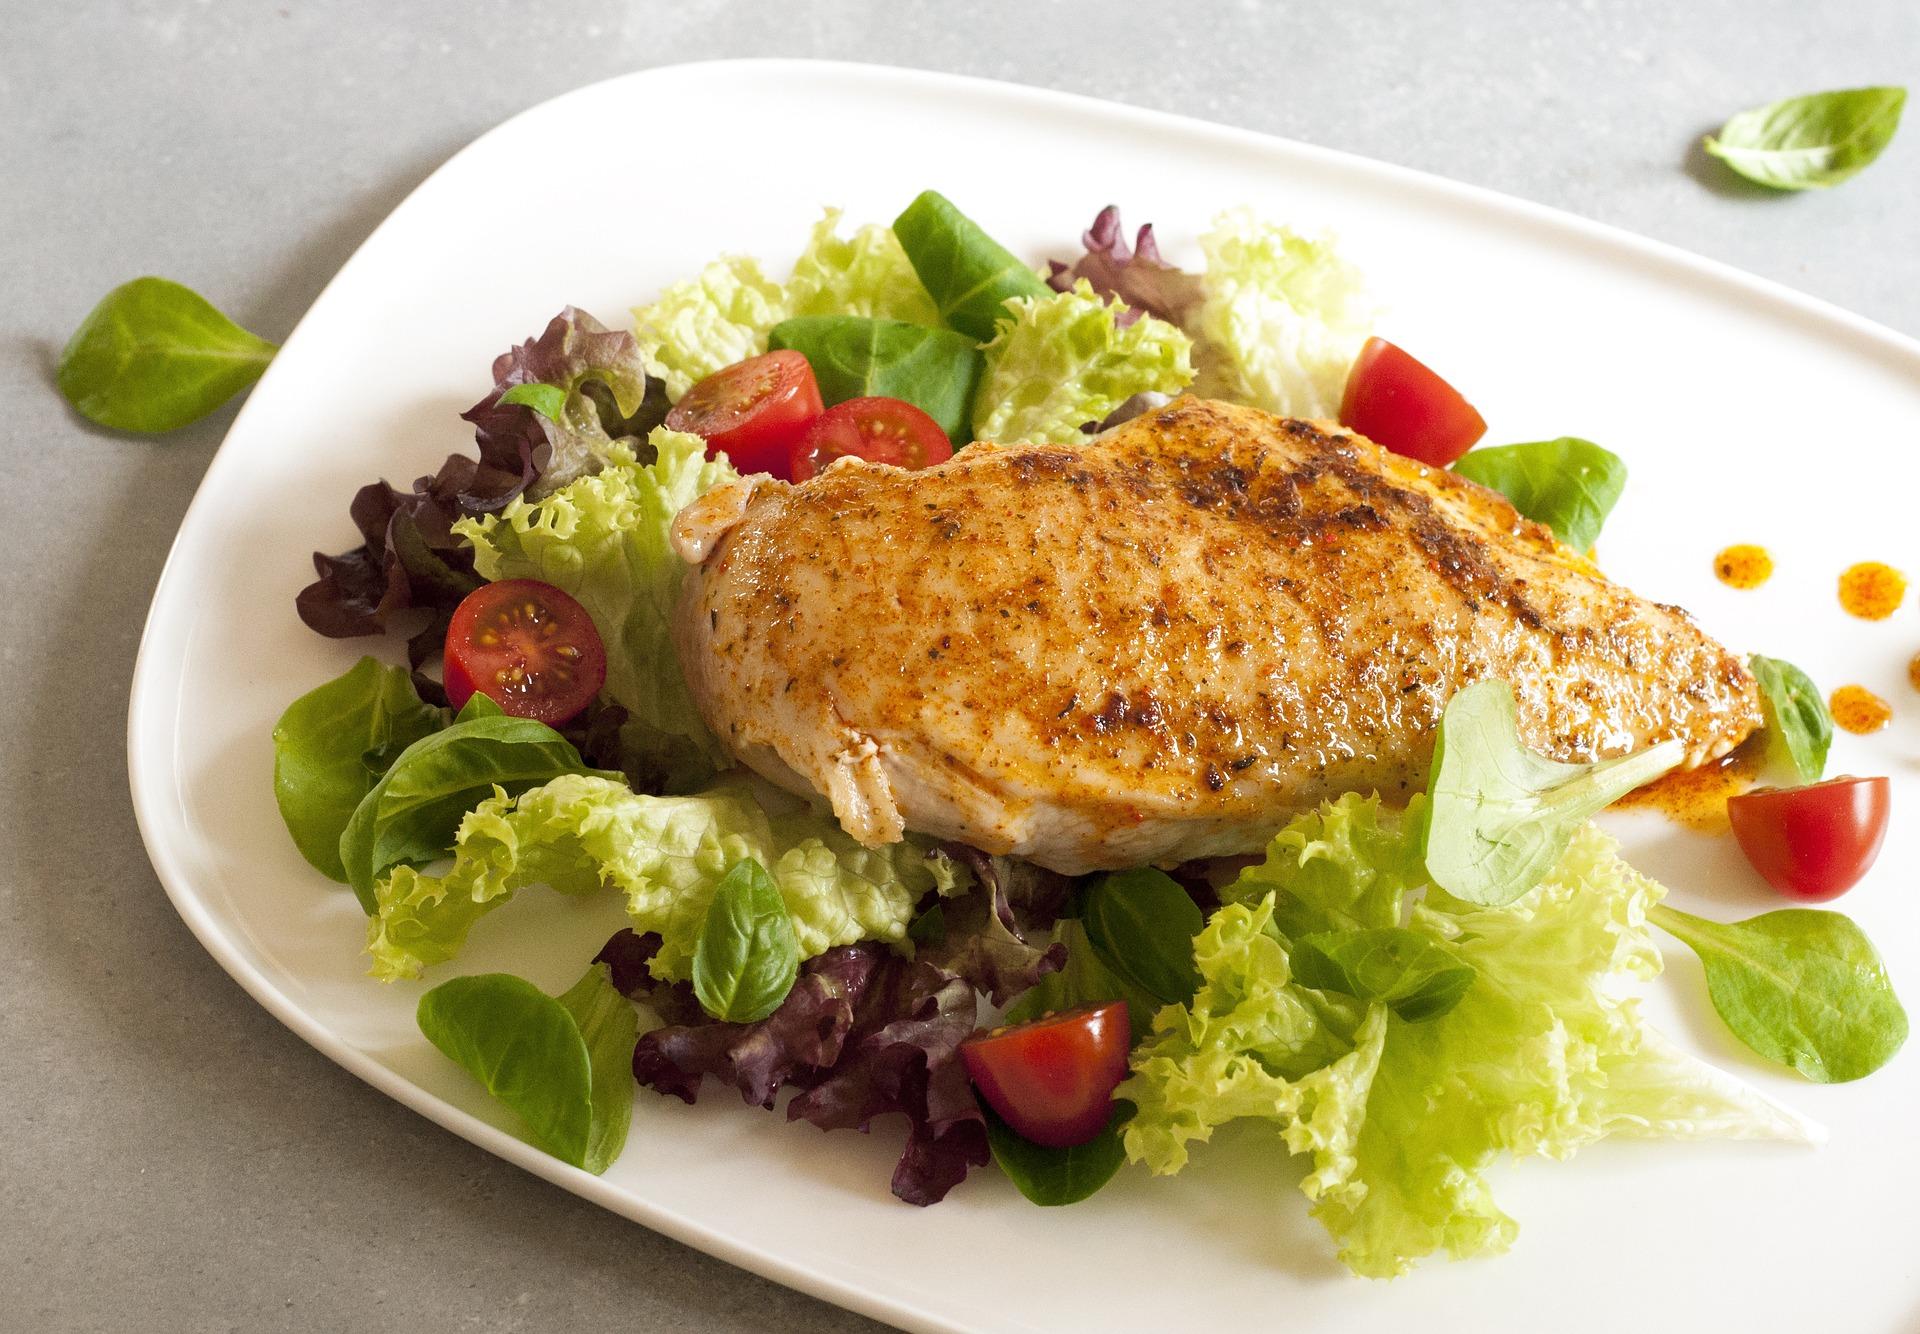 Teriyaki Chicken Breast